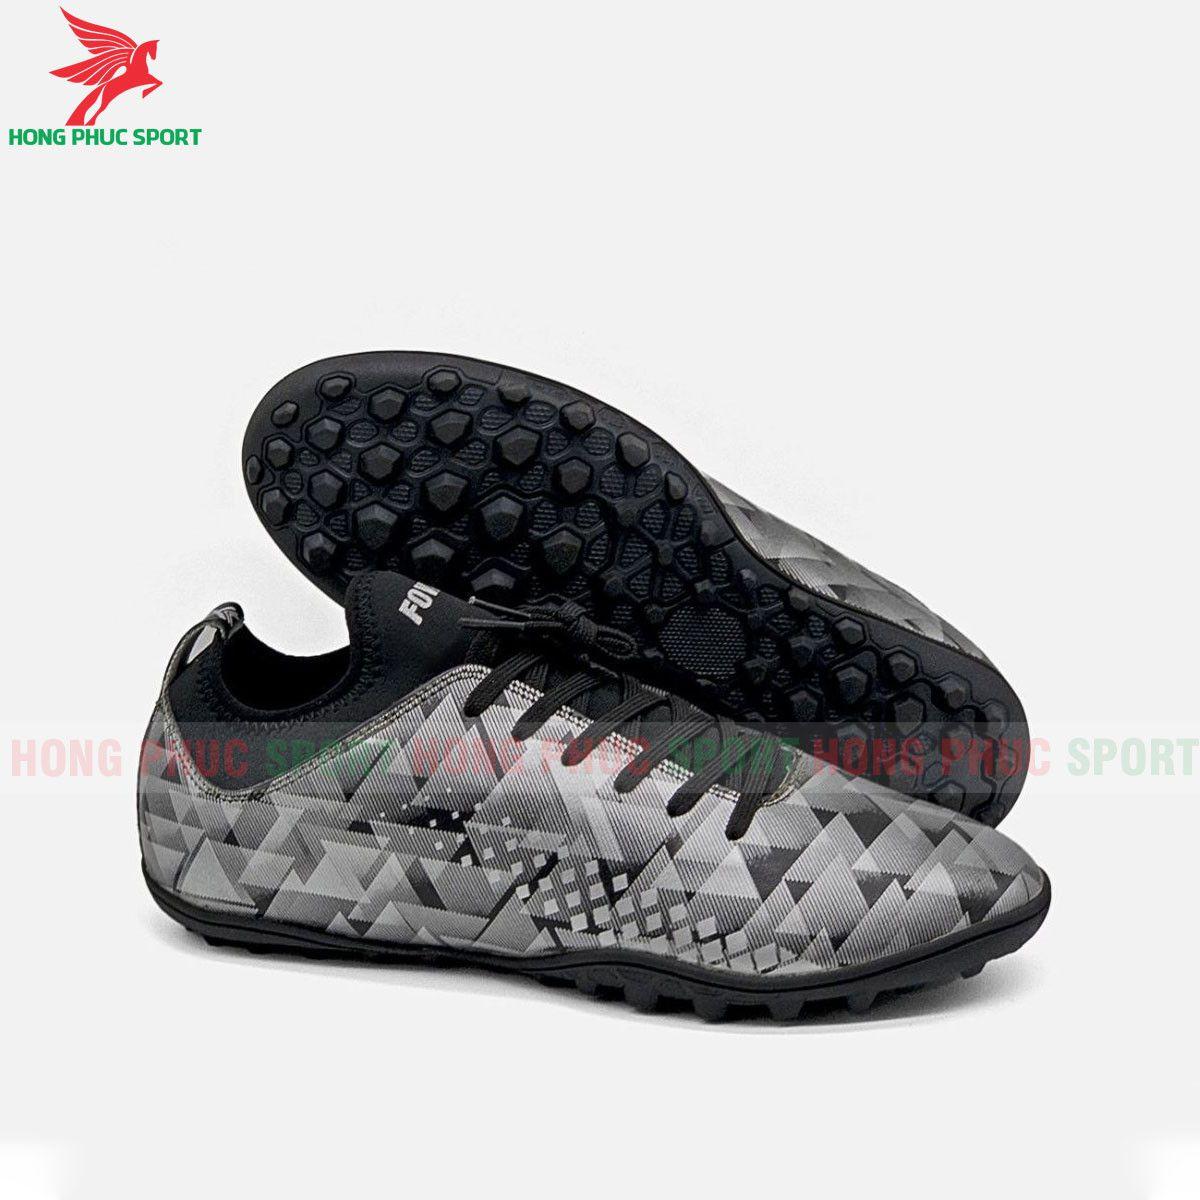 https://cdn.hongphucsport.com/unsafe/s4.shopbay.vn/files/285/giay-bong-da-fovi-debut-den-san-co-nhan-tao-1-60f26158b9846.jpg